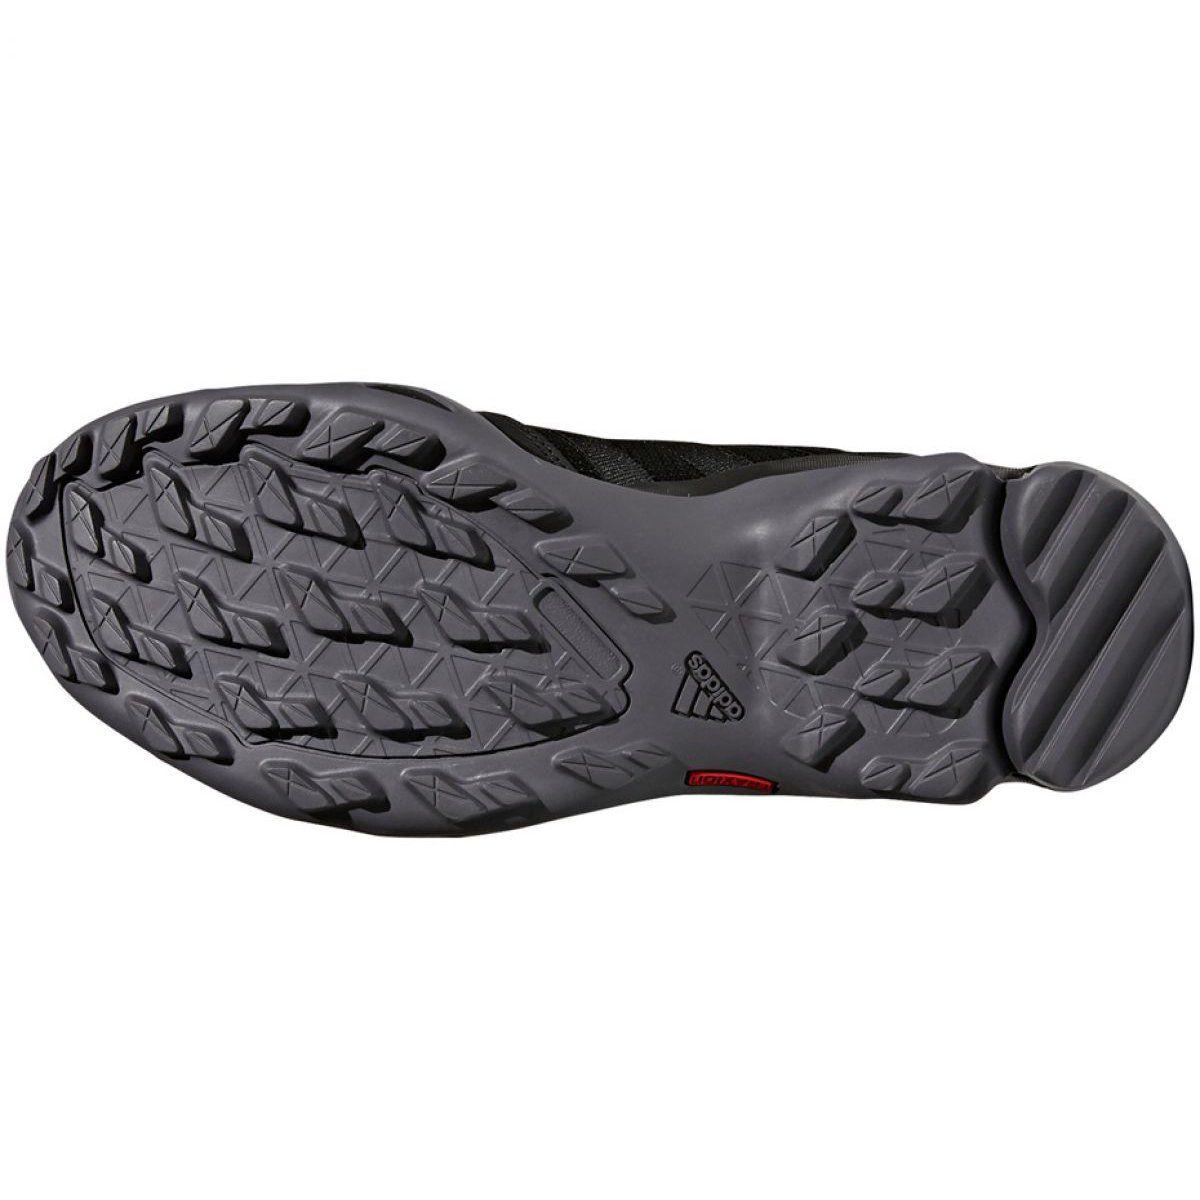 Buty adidas Terrex AX2R M CM7725 czarne (With images) | Buty ...